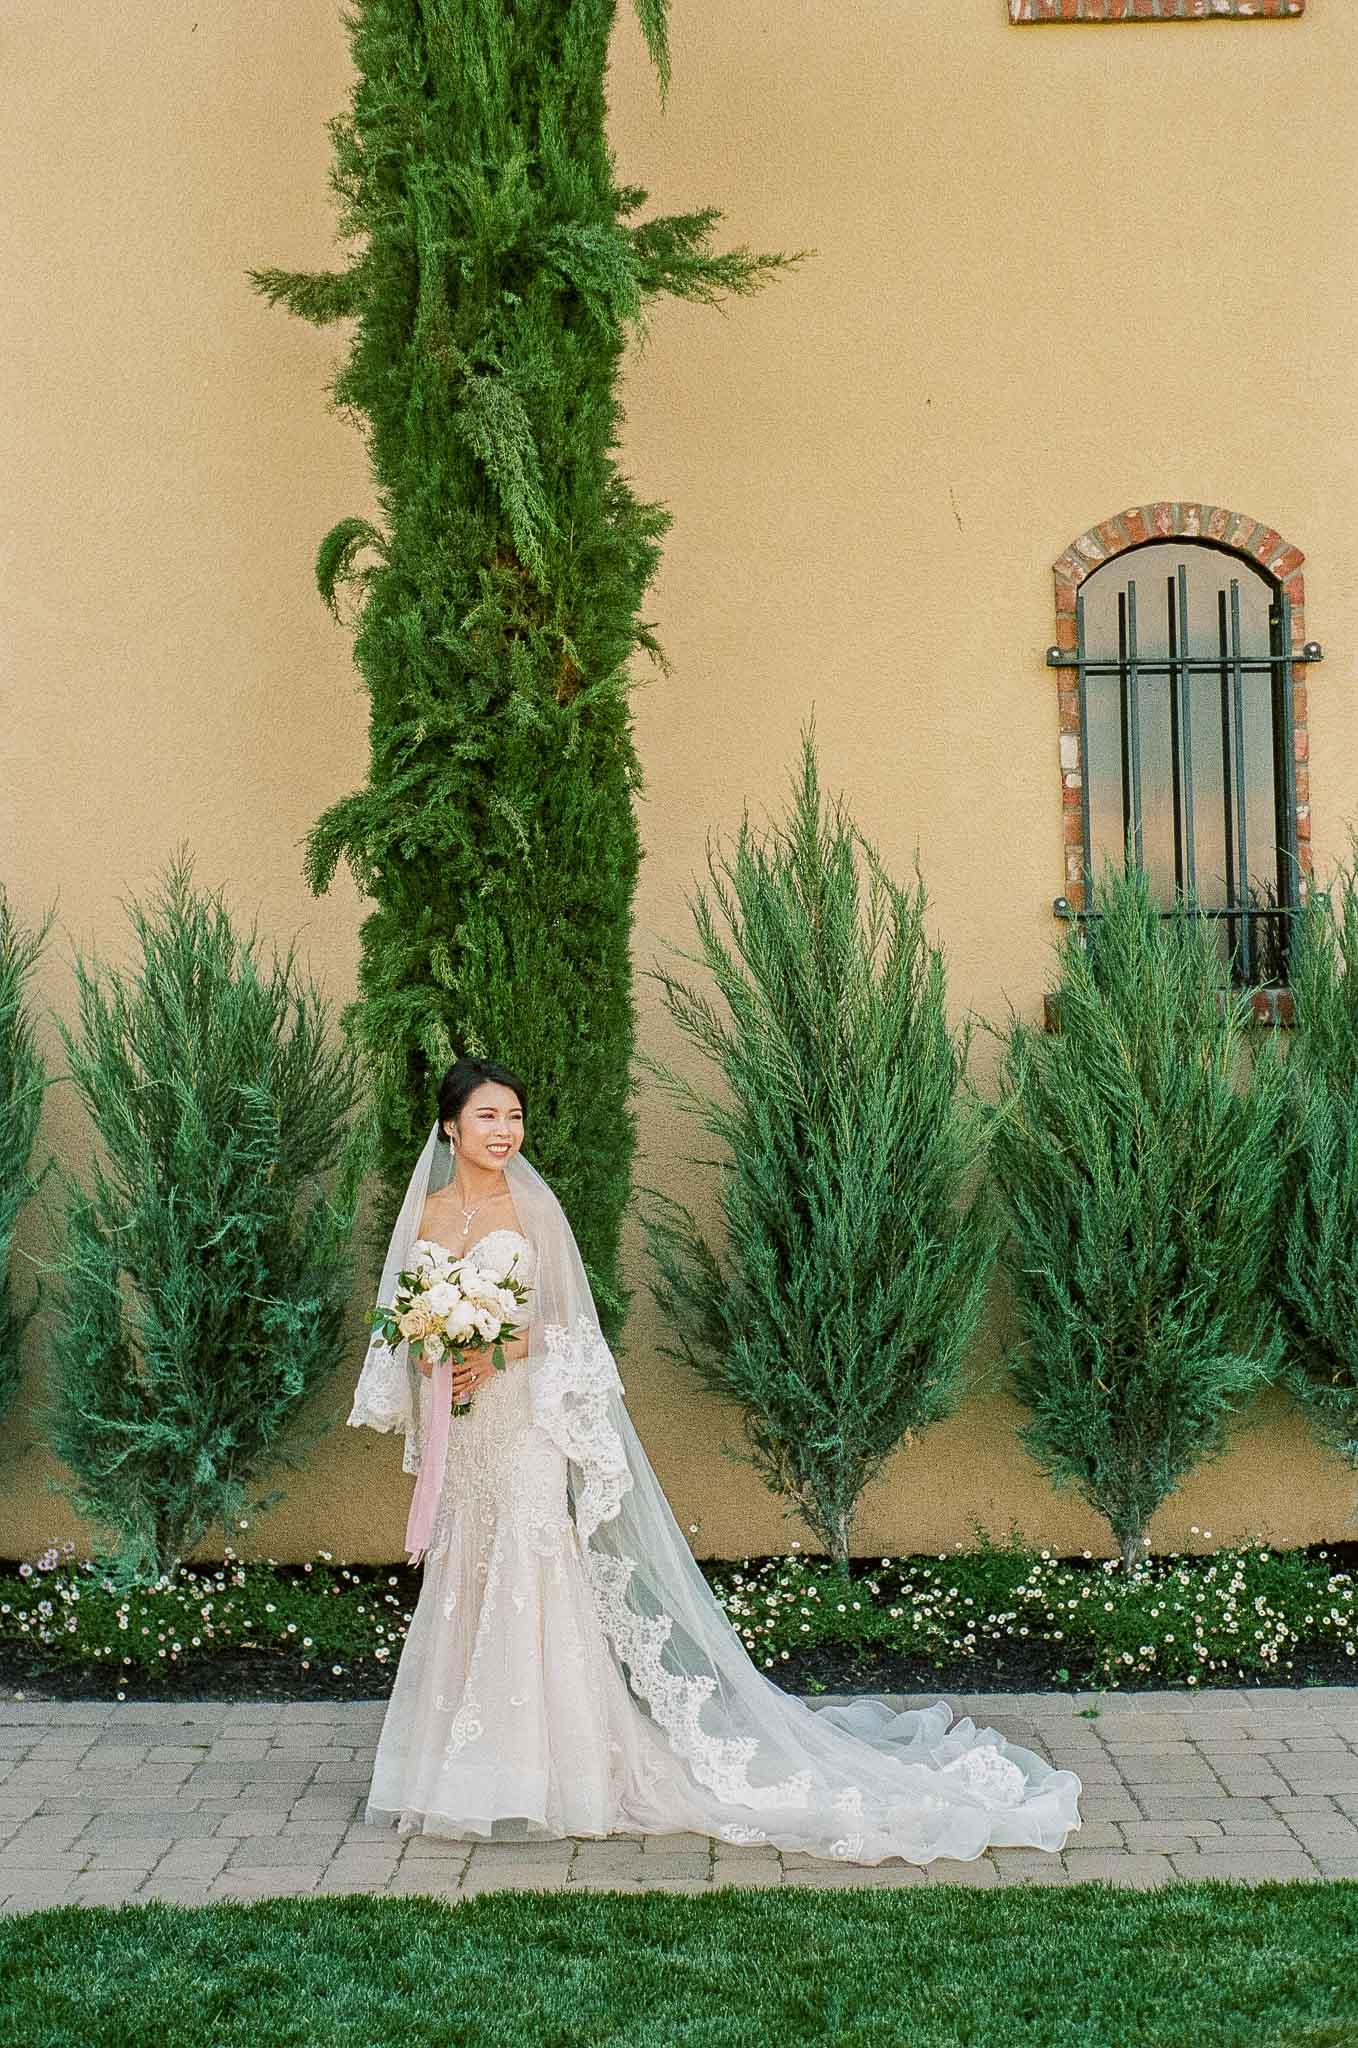 Bride-Flowers-Outside.jpg